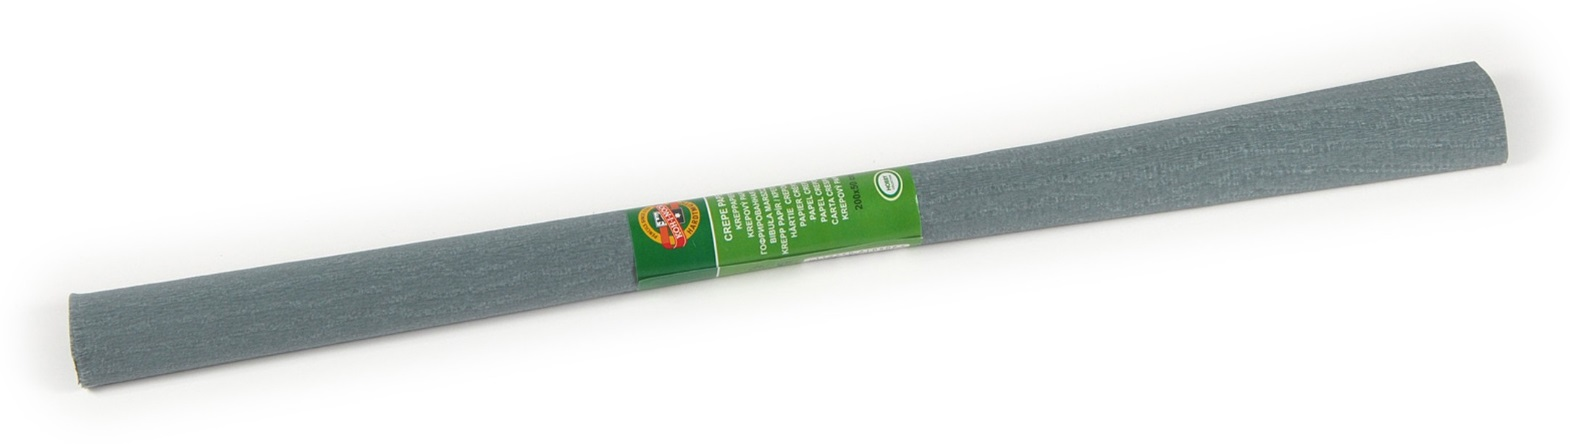 Krepový papír 50 x 200 cm, šedý, KOH-I-NOOR